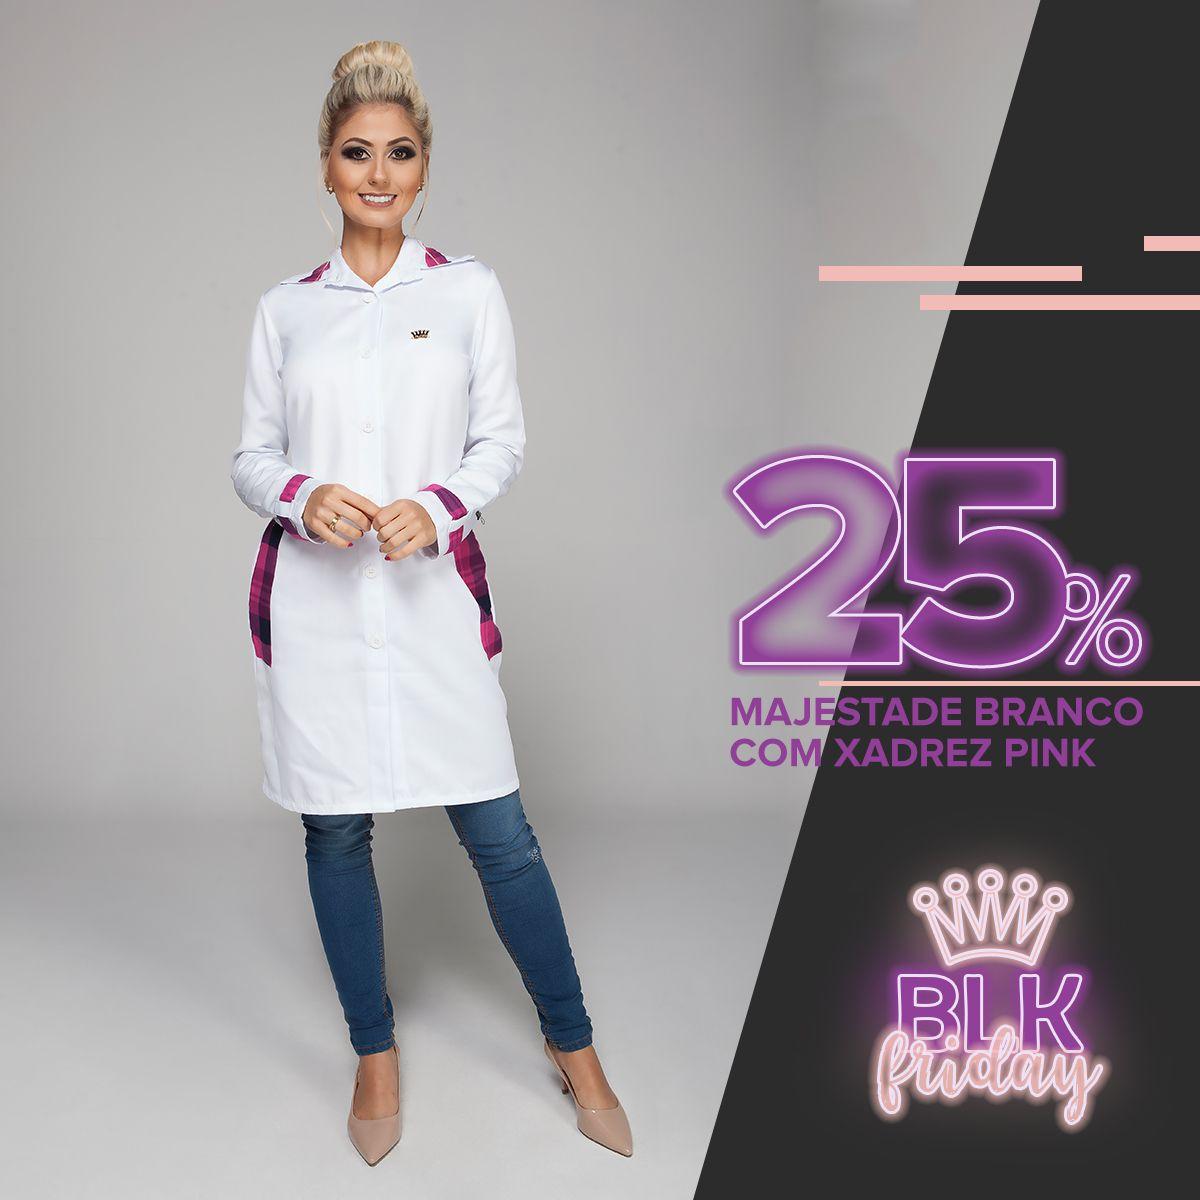 Majestade Branco com Xadrez Pink